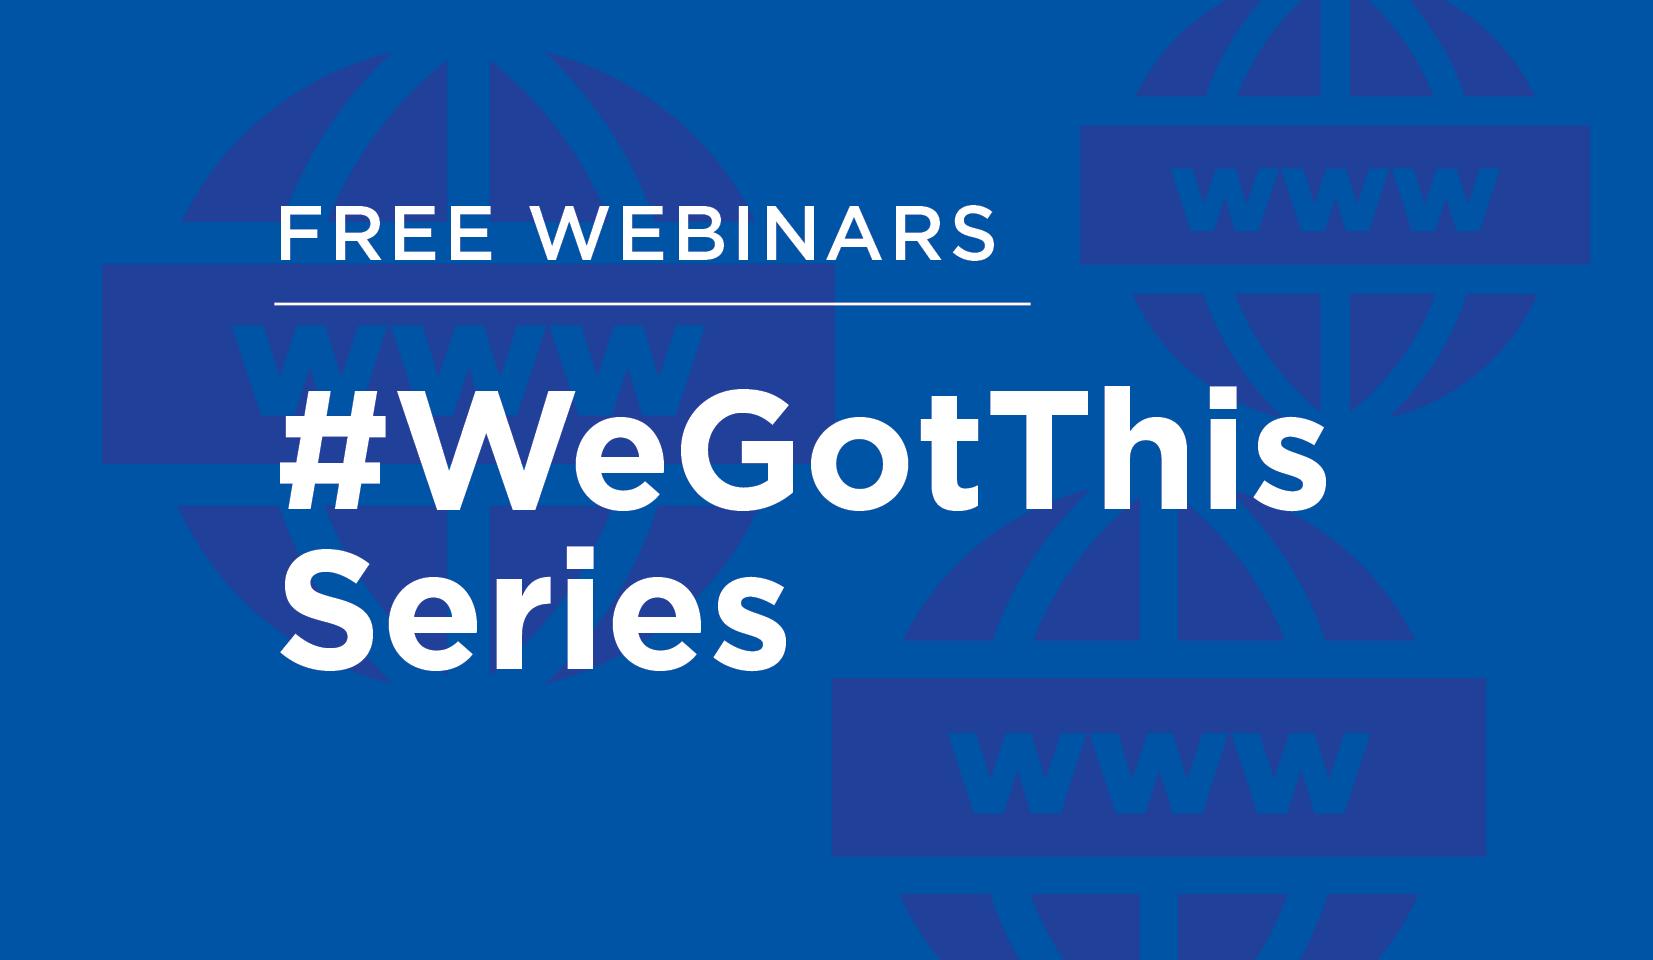 #WeGotThis Series: Free Webinars